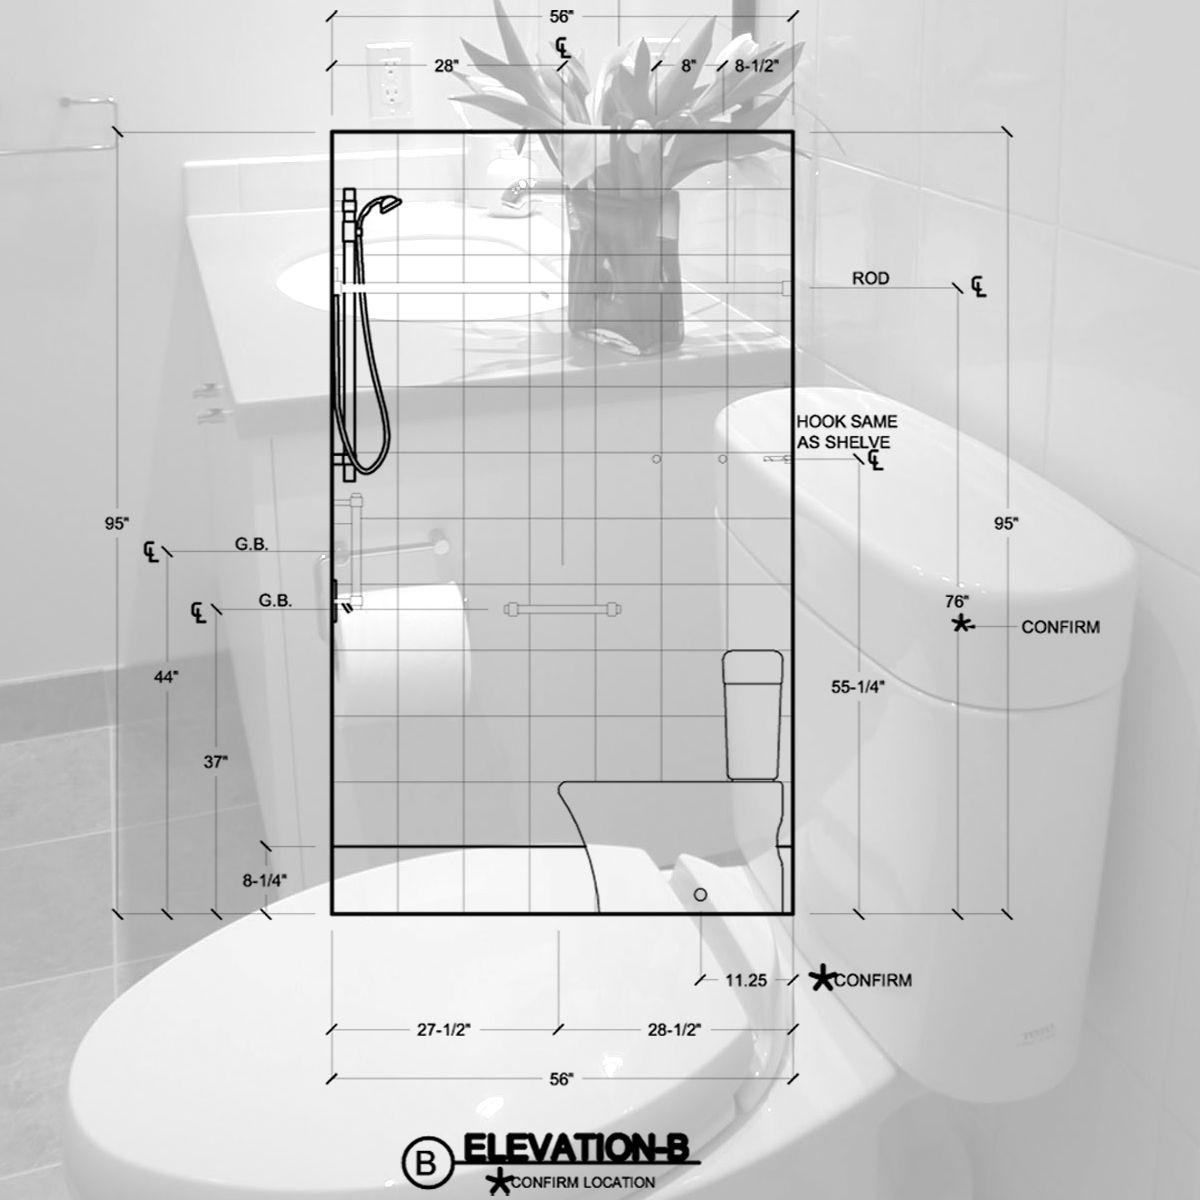 4 x 8 bathroom layout - My Web Value | 5x7 bathroom layout ...